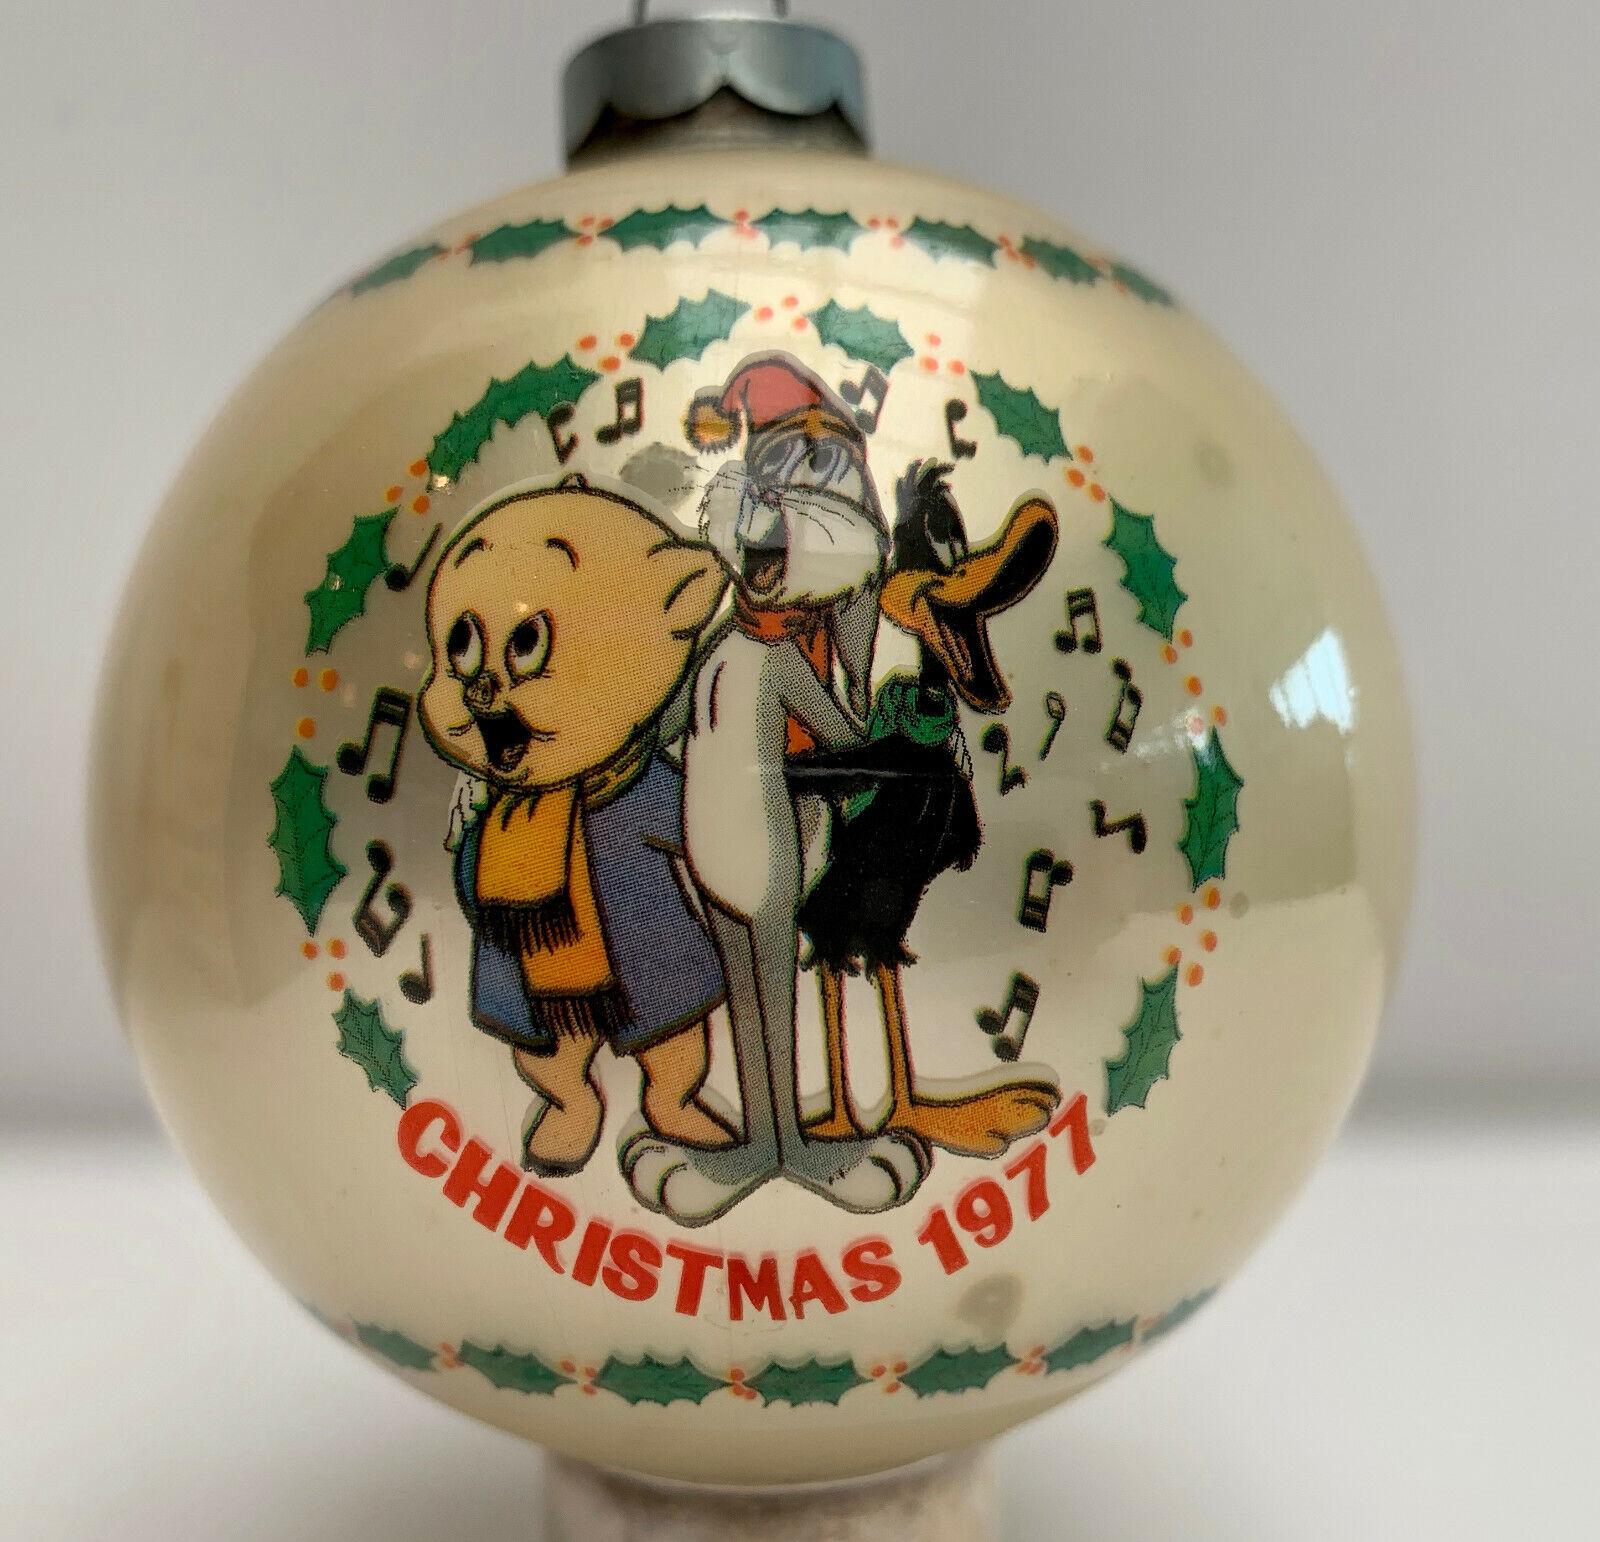 LOONEY TUNES BUGS DAFFY CHRISTMAS 1977 FIRST EDIT GLASS ORNAMENT ORIG BOX VINTAG